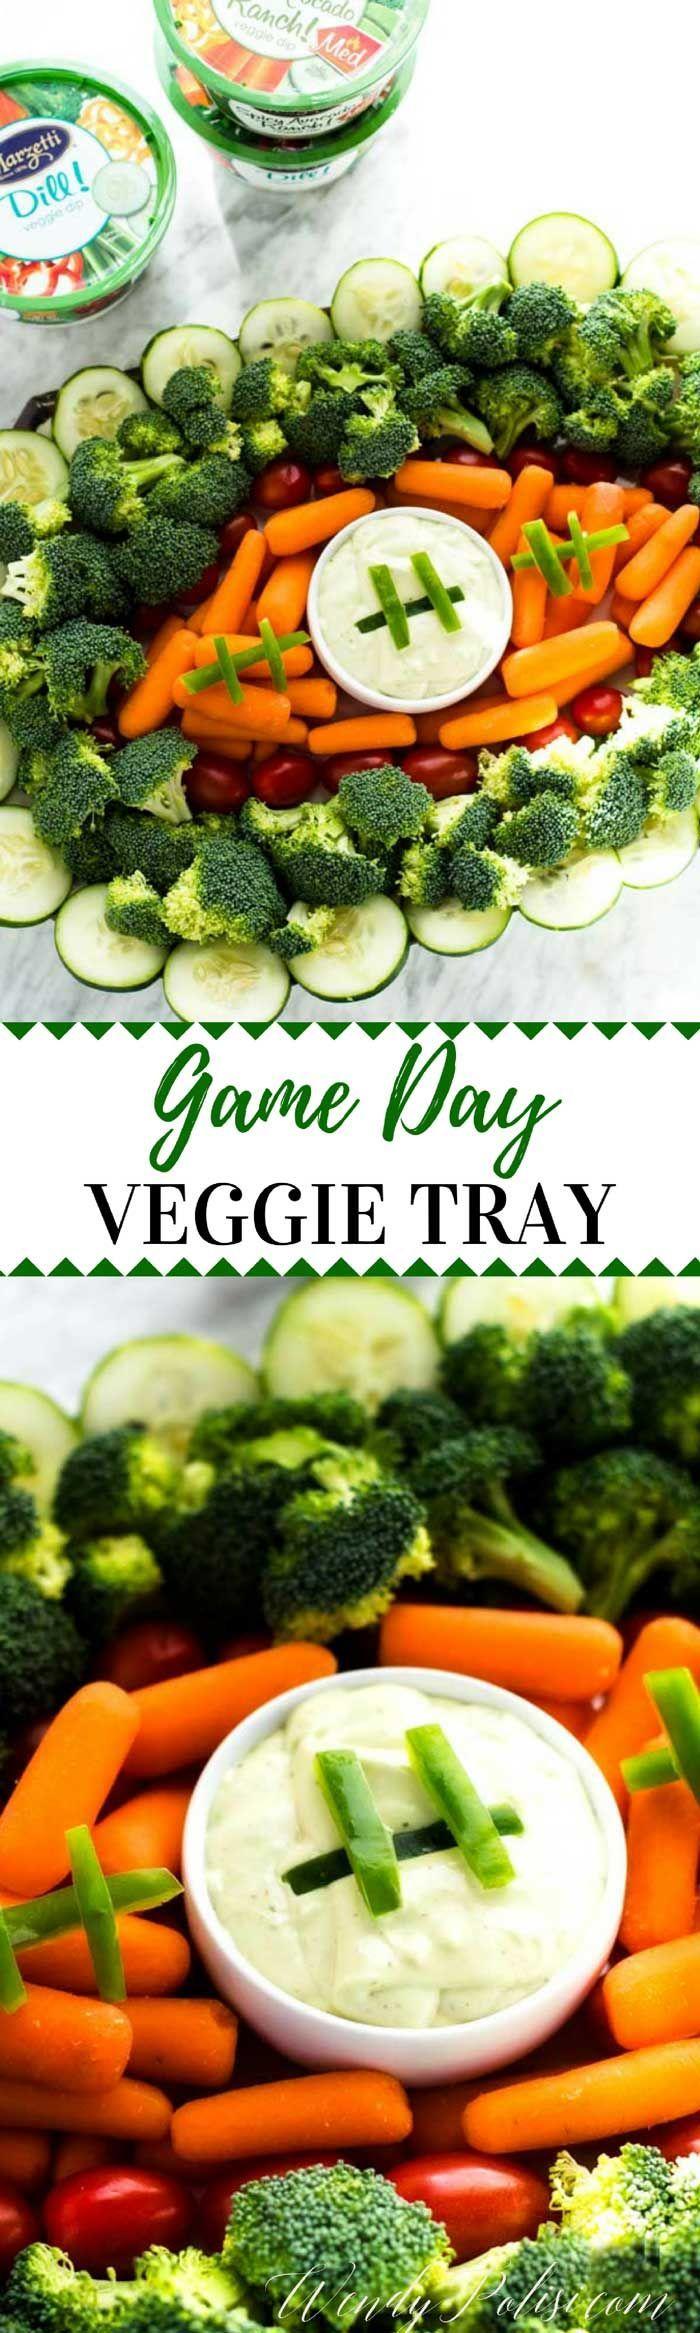 Game Day Veggie Tray Veggie tray, Veggies, Healthy